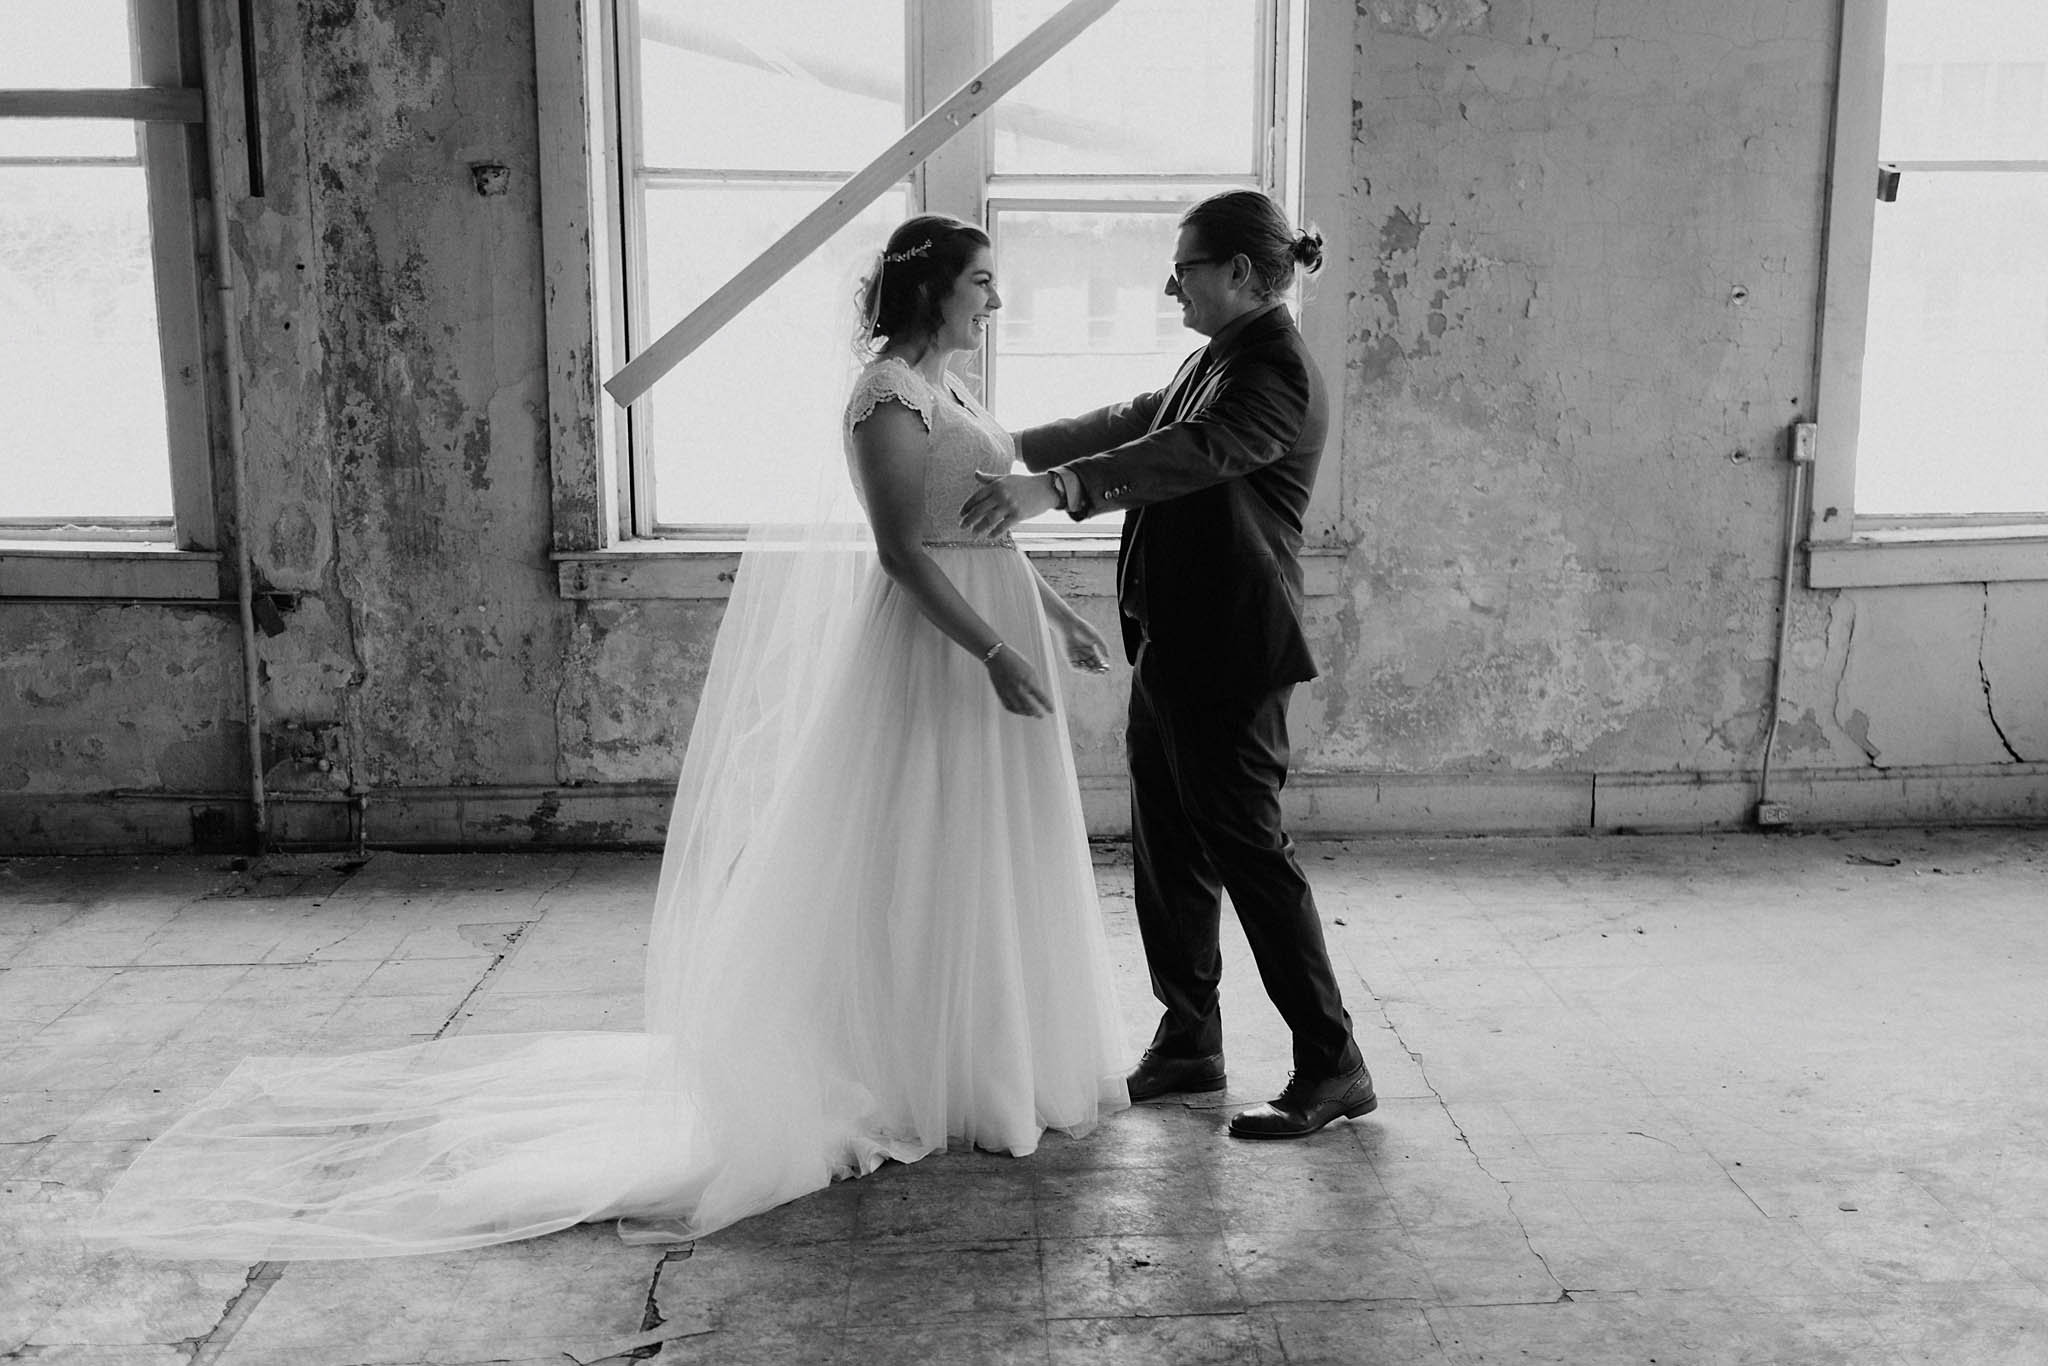 cincinnati warehouse wedding photographer bride and groom first look